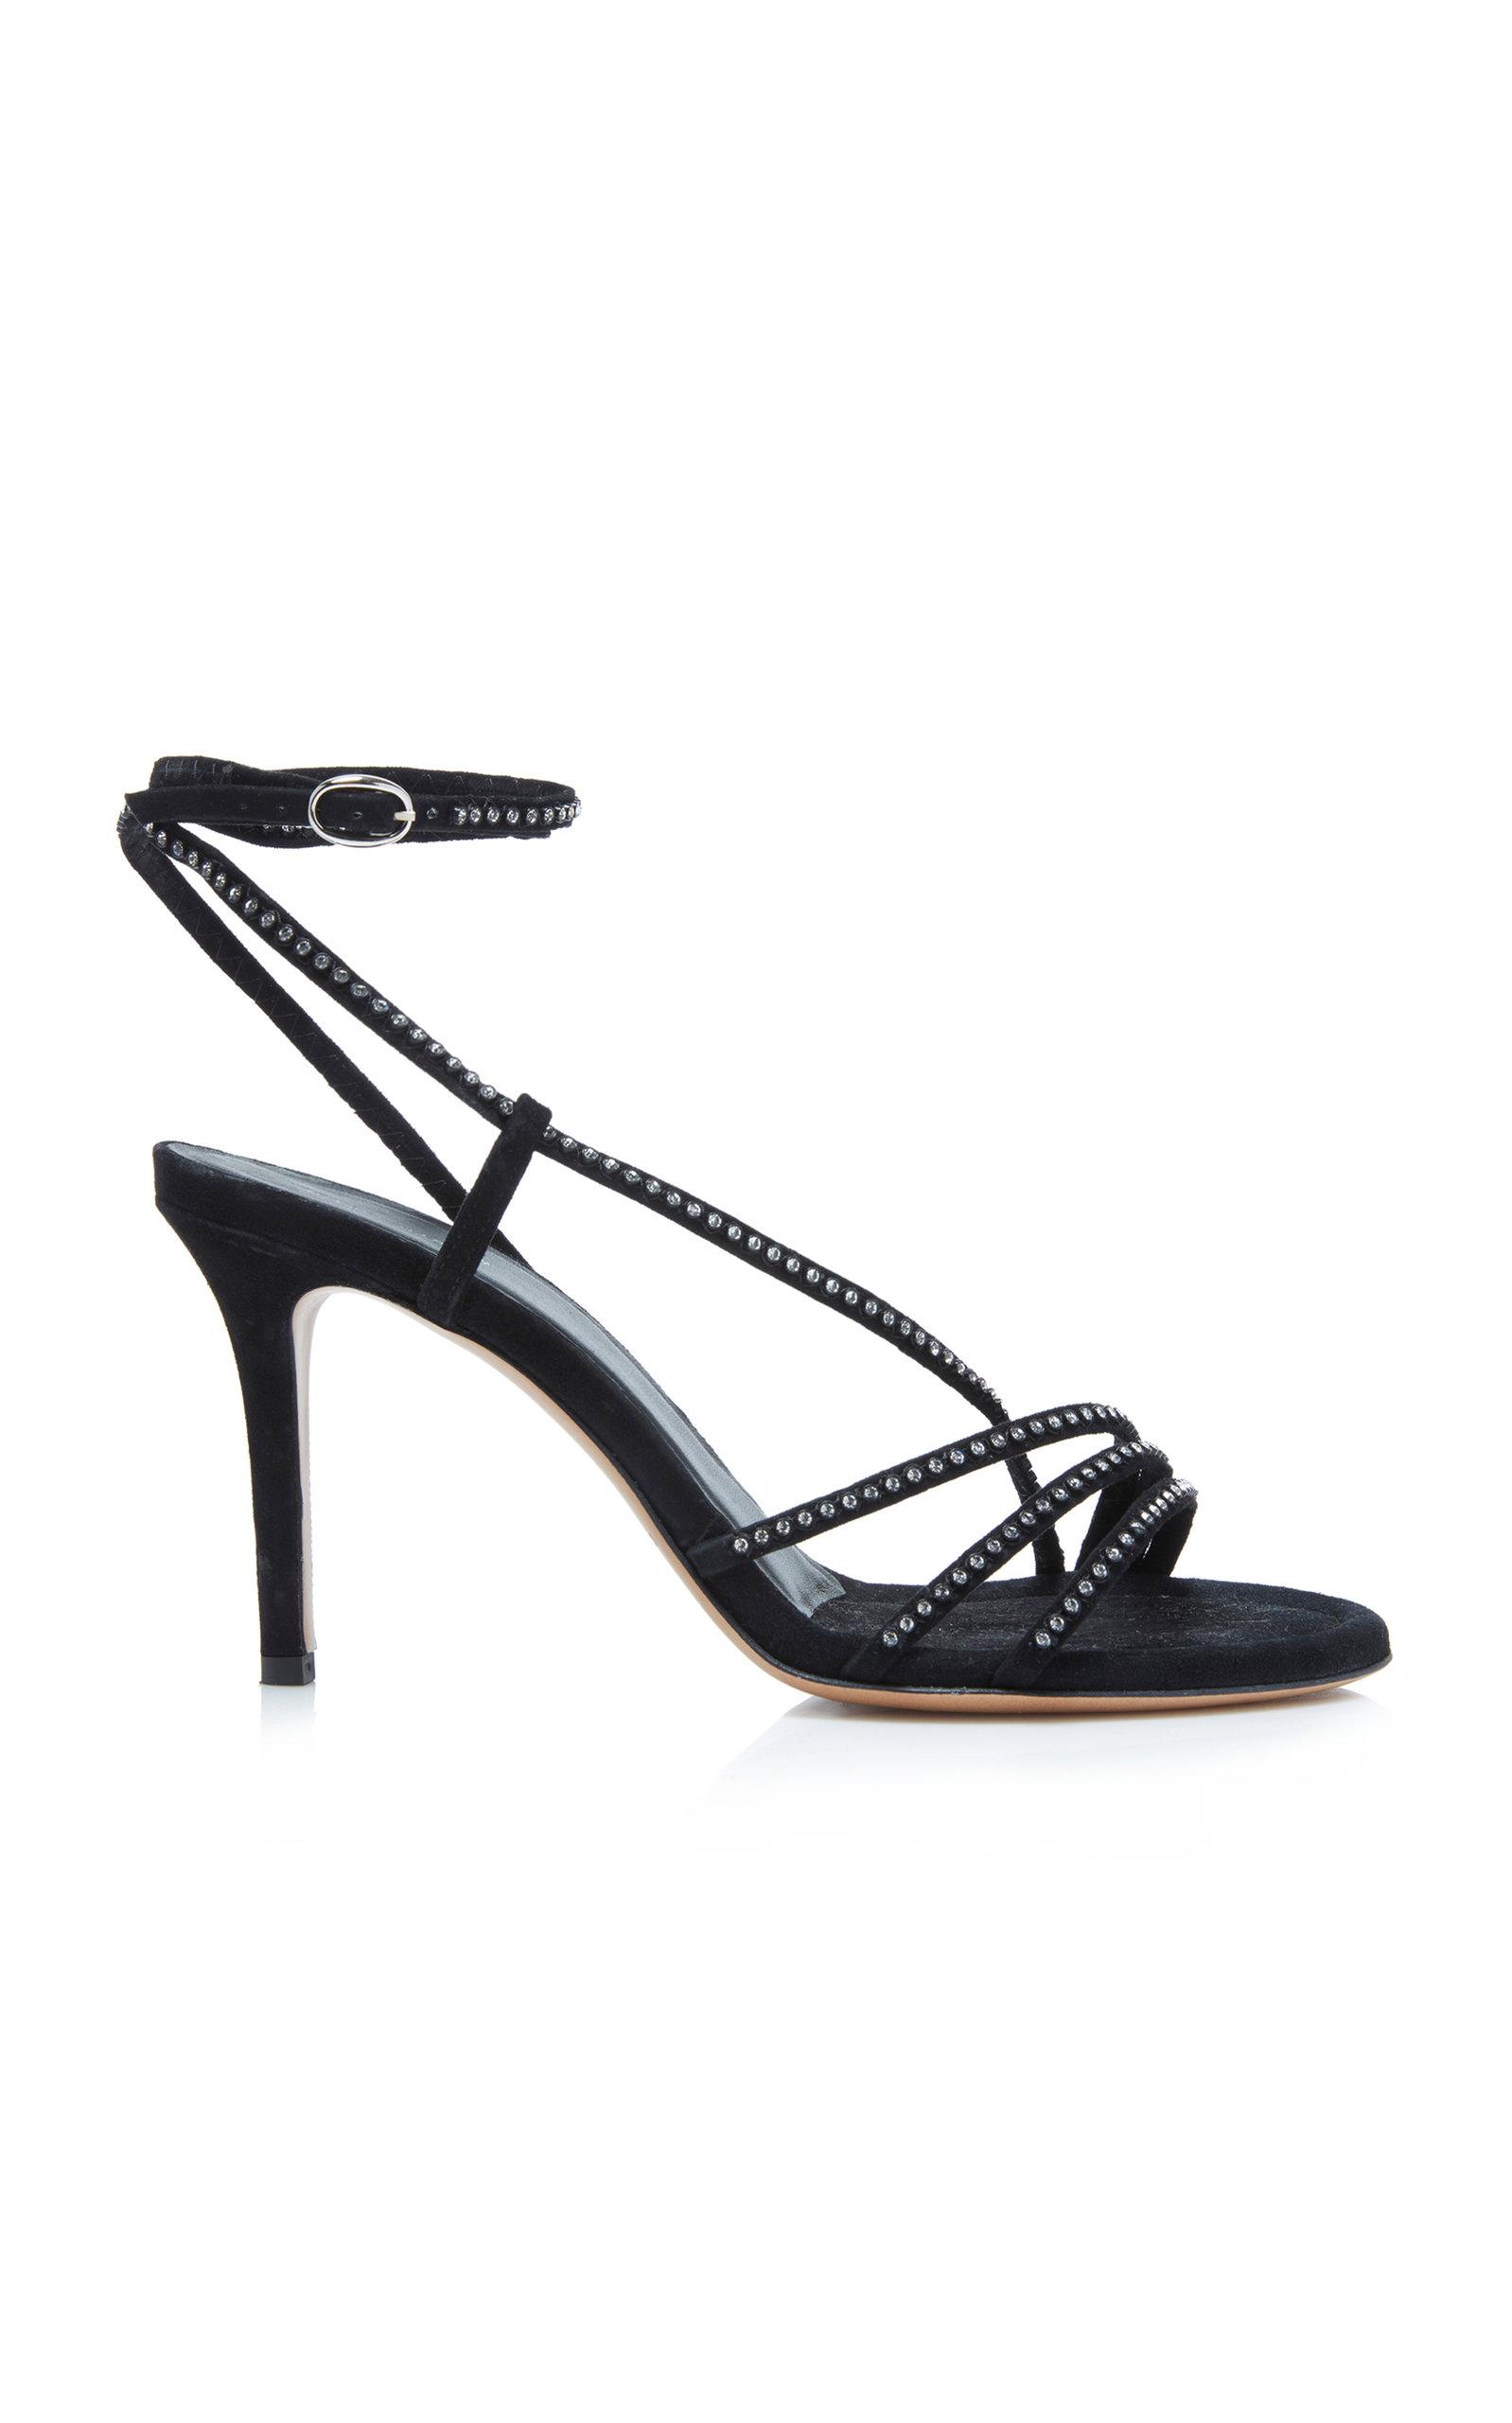 fee3915b21cb Isabel Marant Ampsee Crystal-Embellished Suede Sandals In Black ...